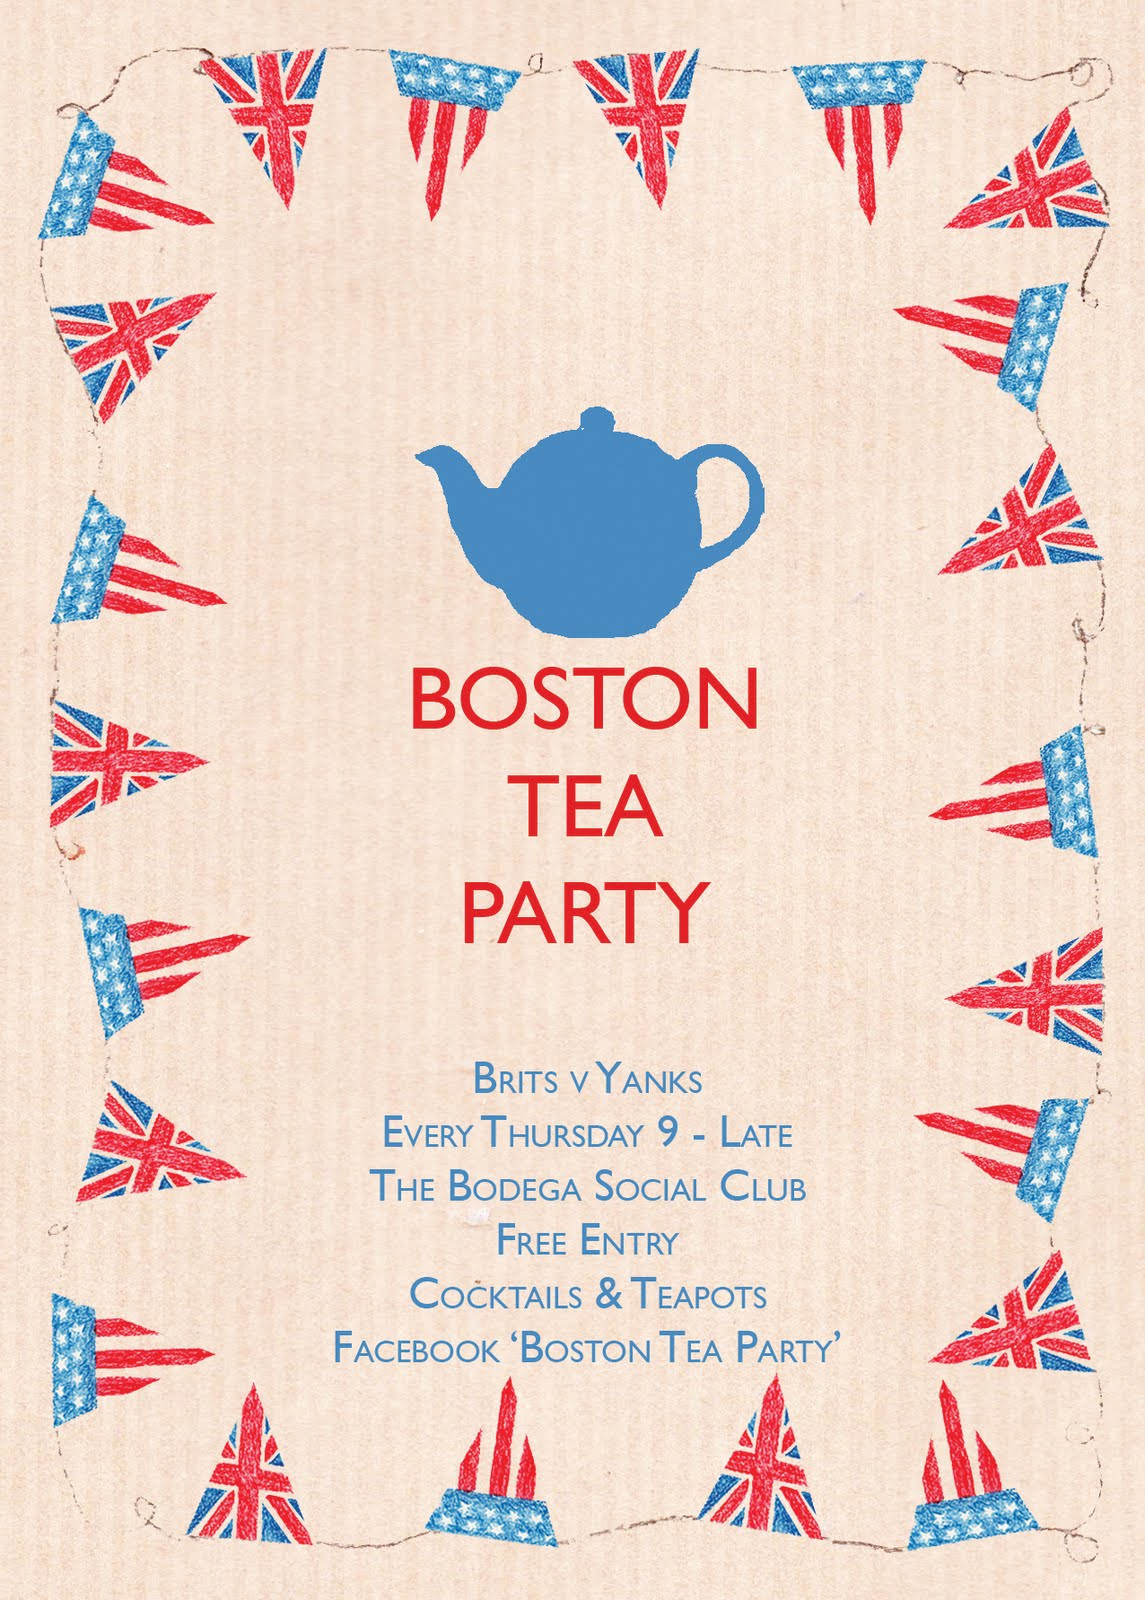 Boston Tea Party Poster Ideas  Georgina Lomas